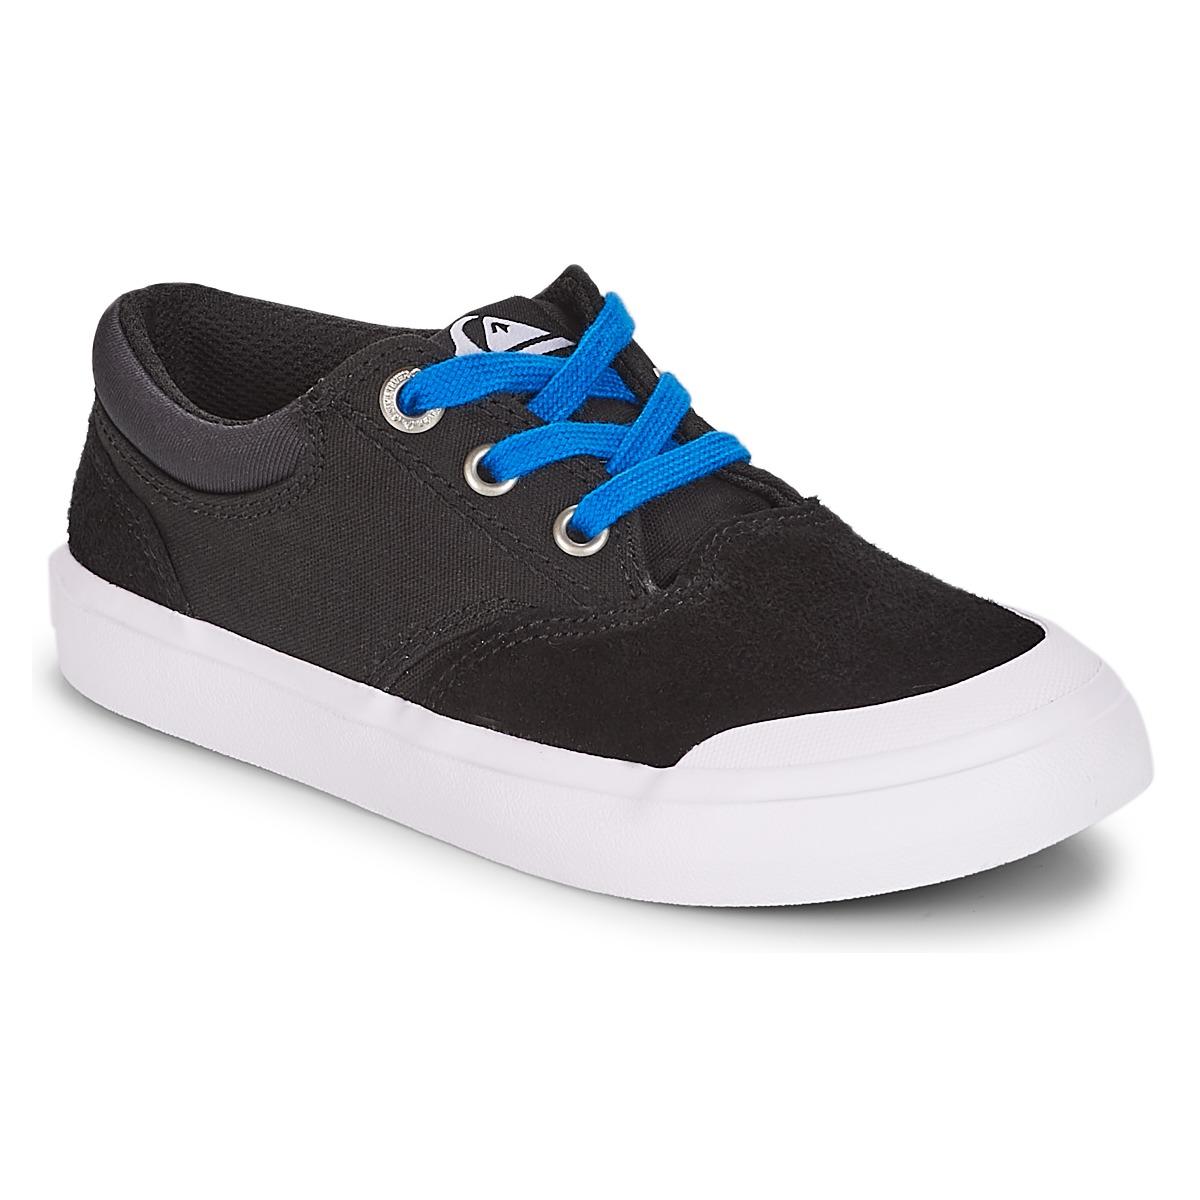 Sneakers til børn Quiksilver  VERANT YOUTH